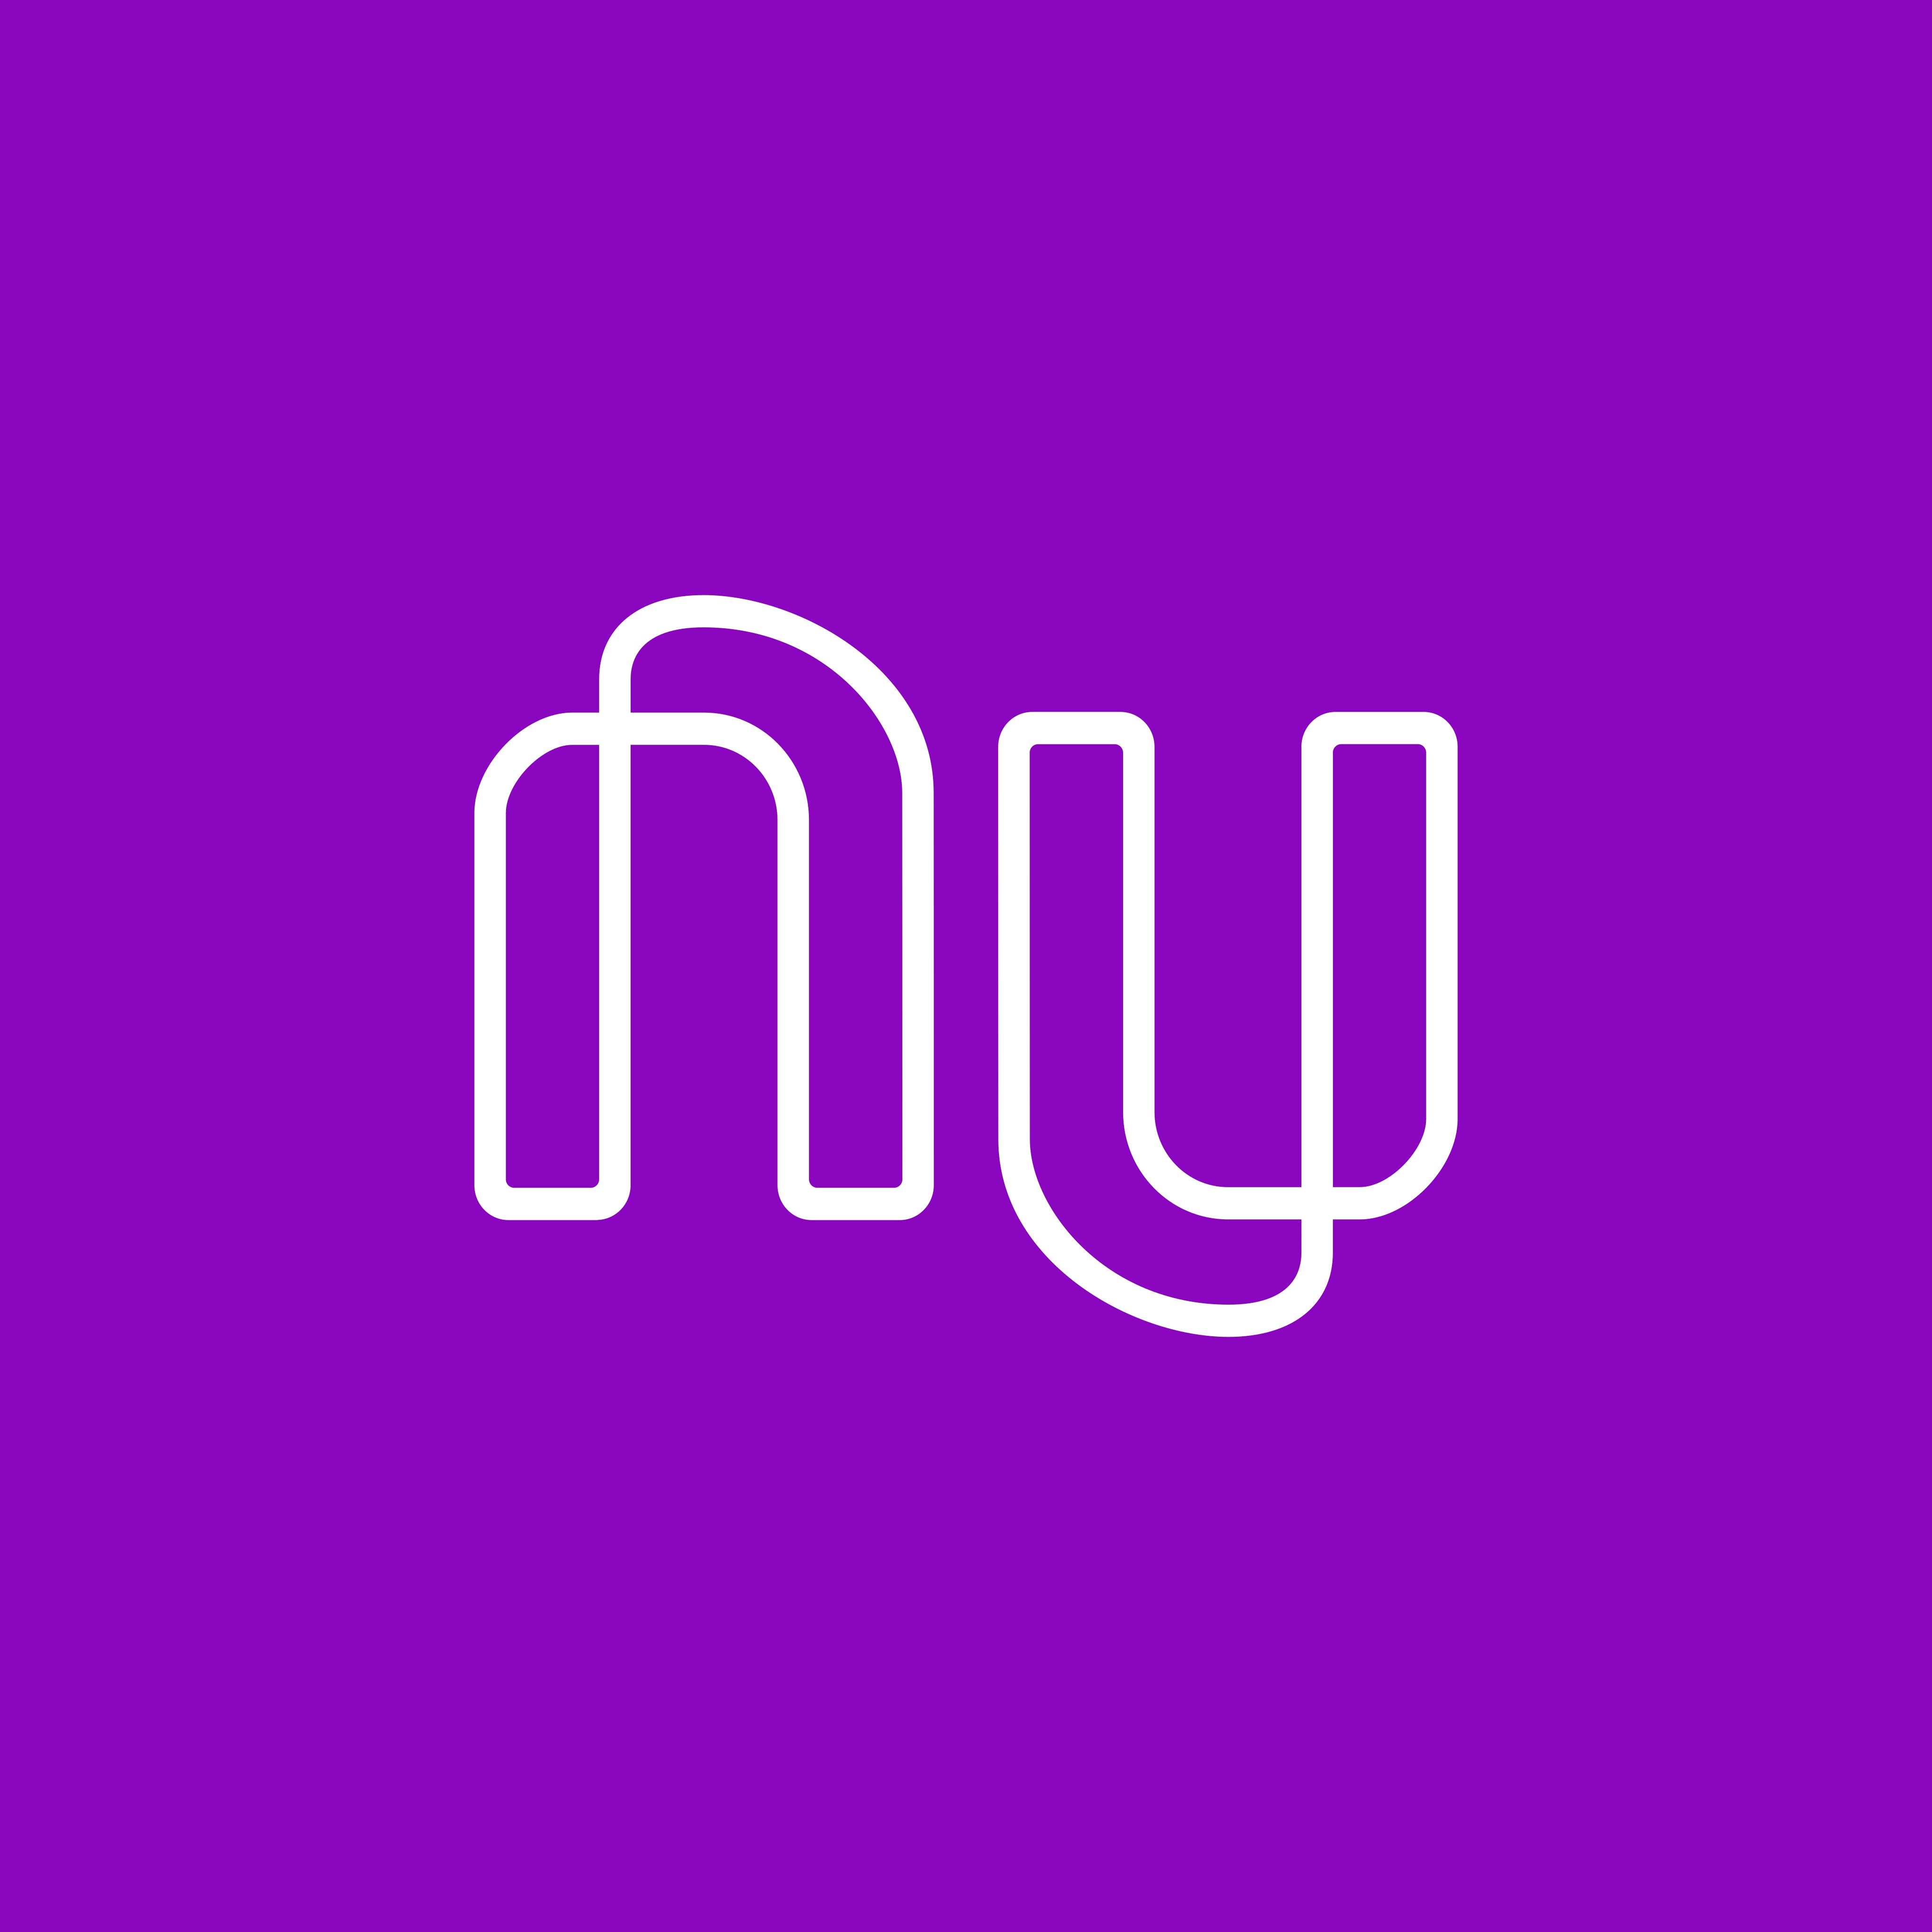 nubank logo 1 - Nubank Logo